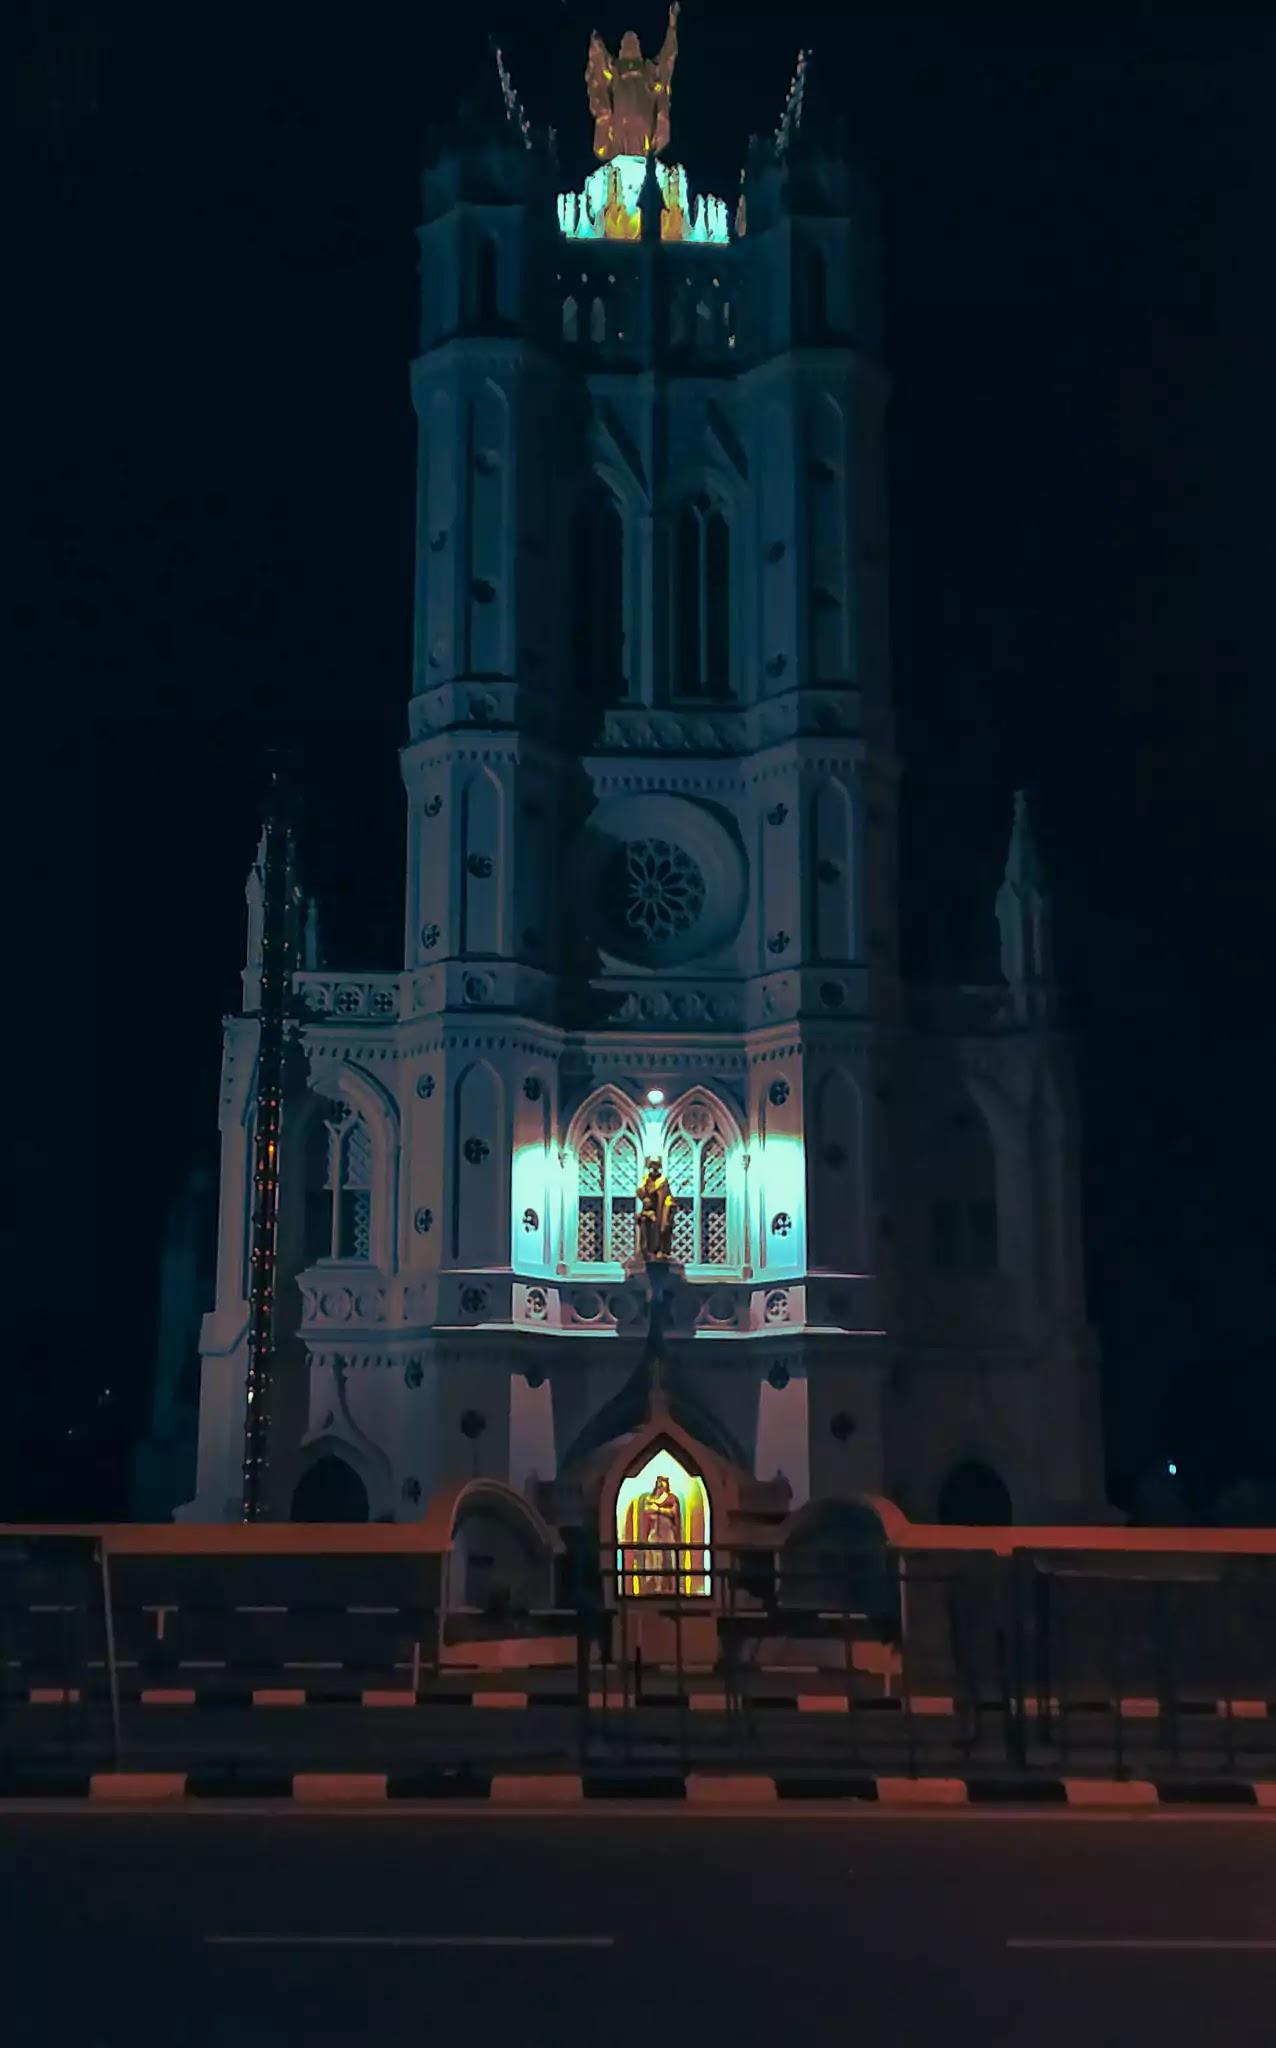 St. Joseph's Metropolitan Cathedral Palayam Trivandrum